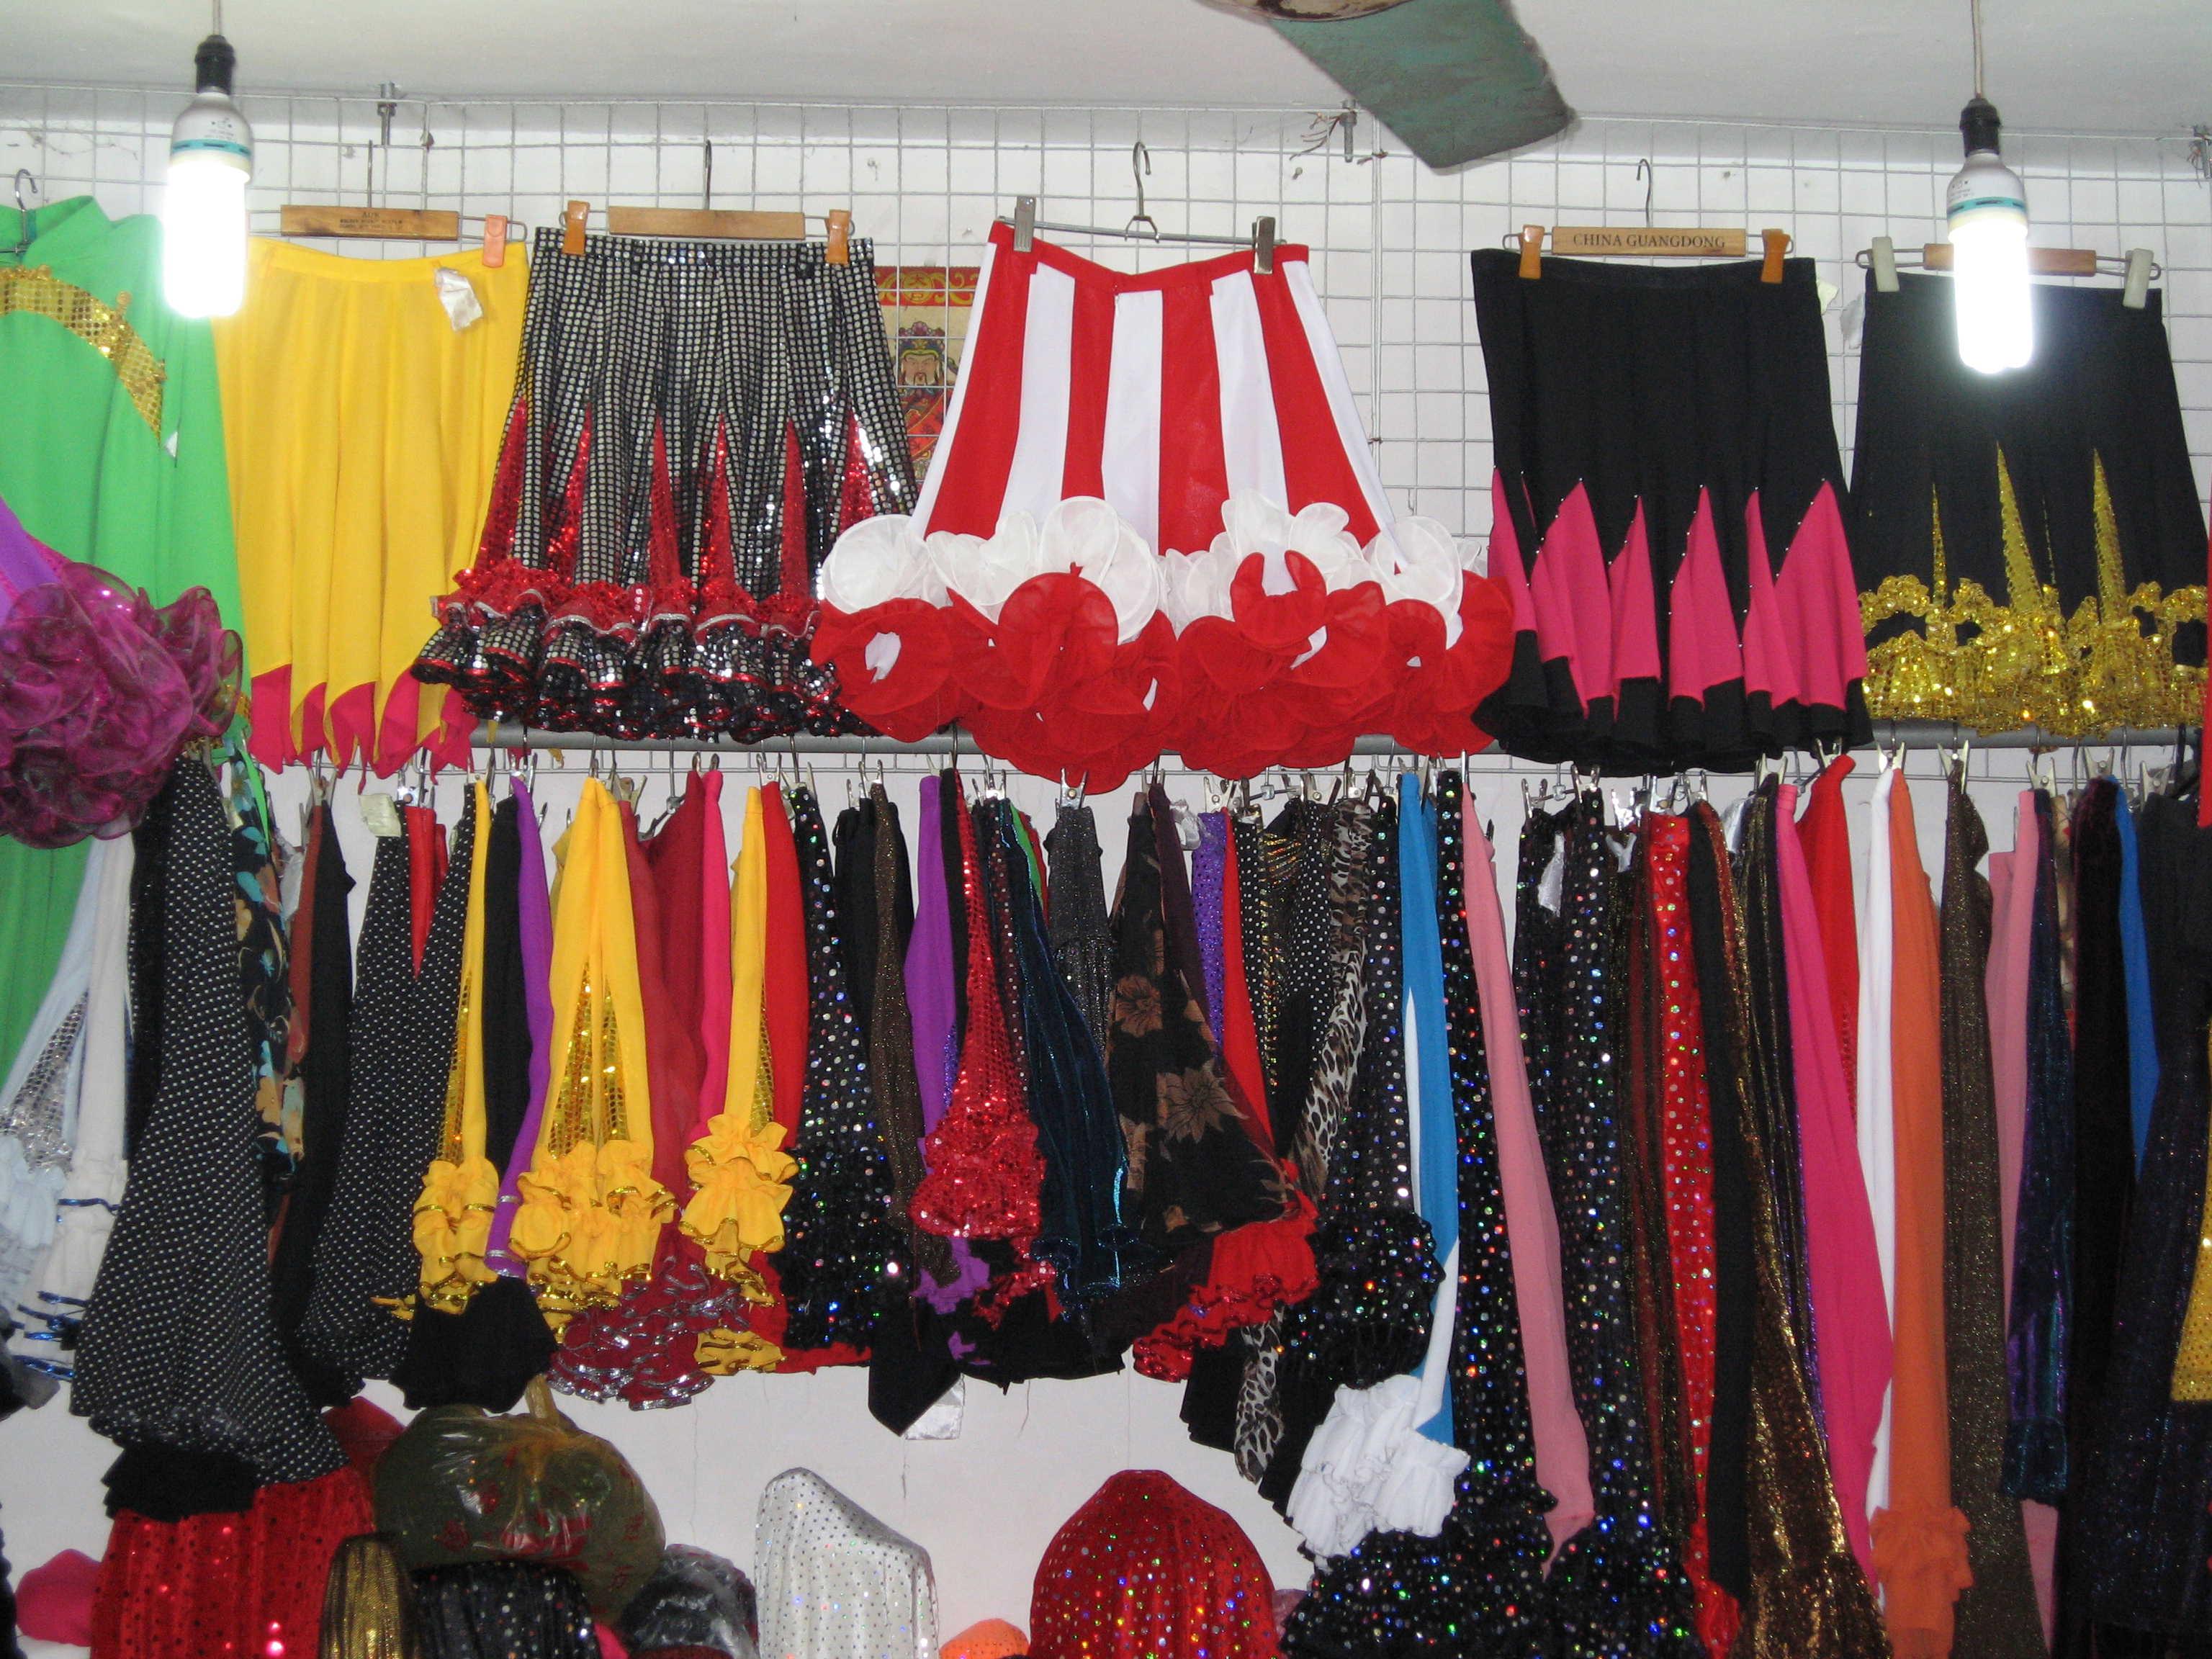 crazy skirts